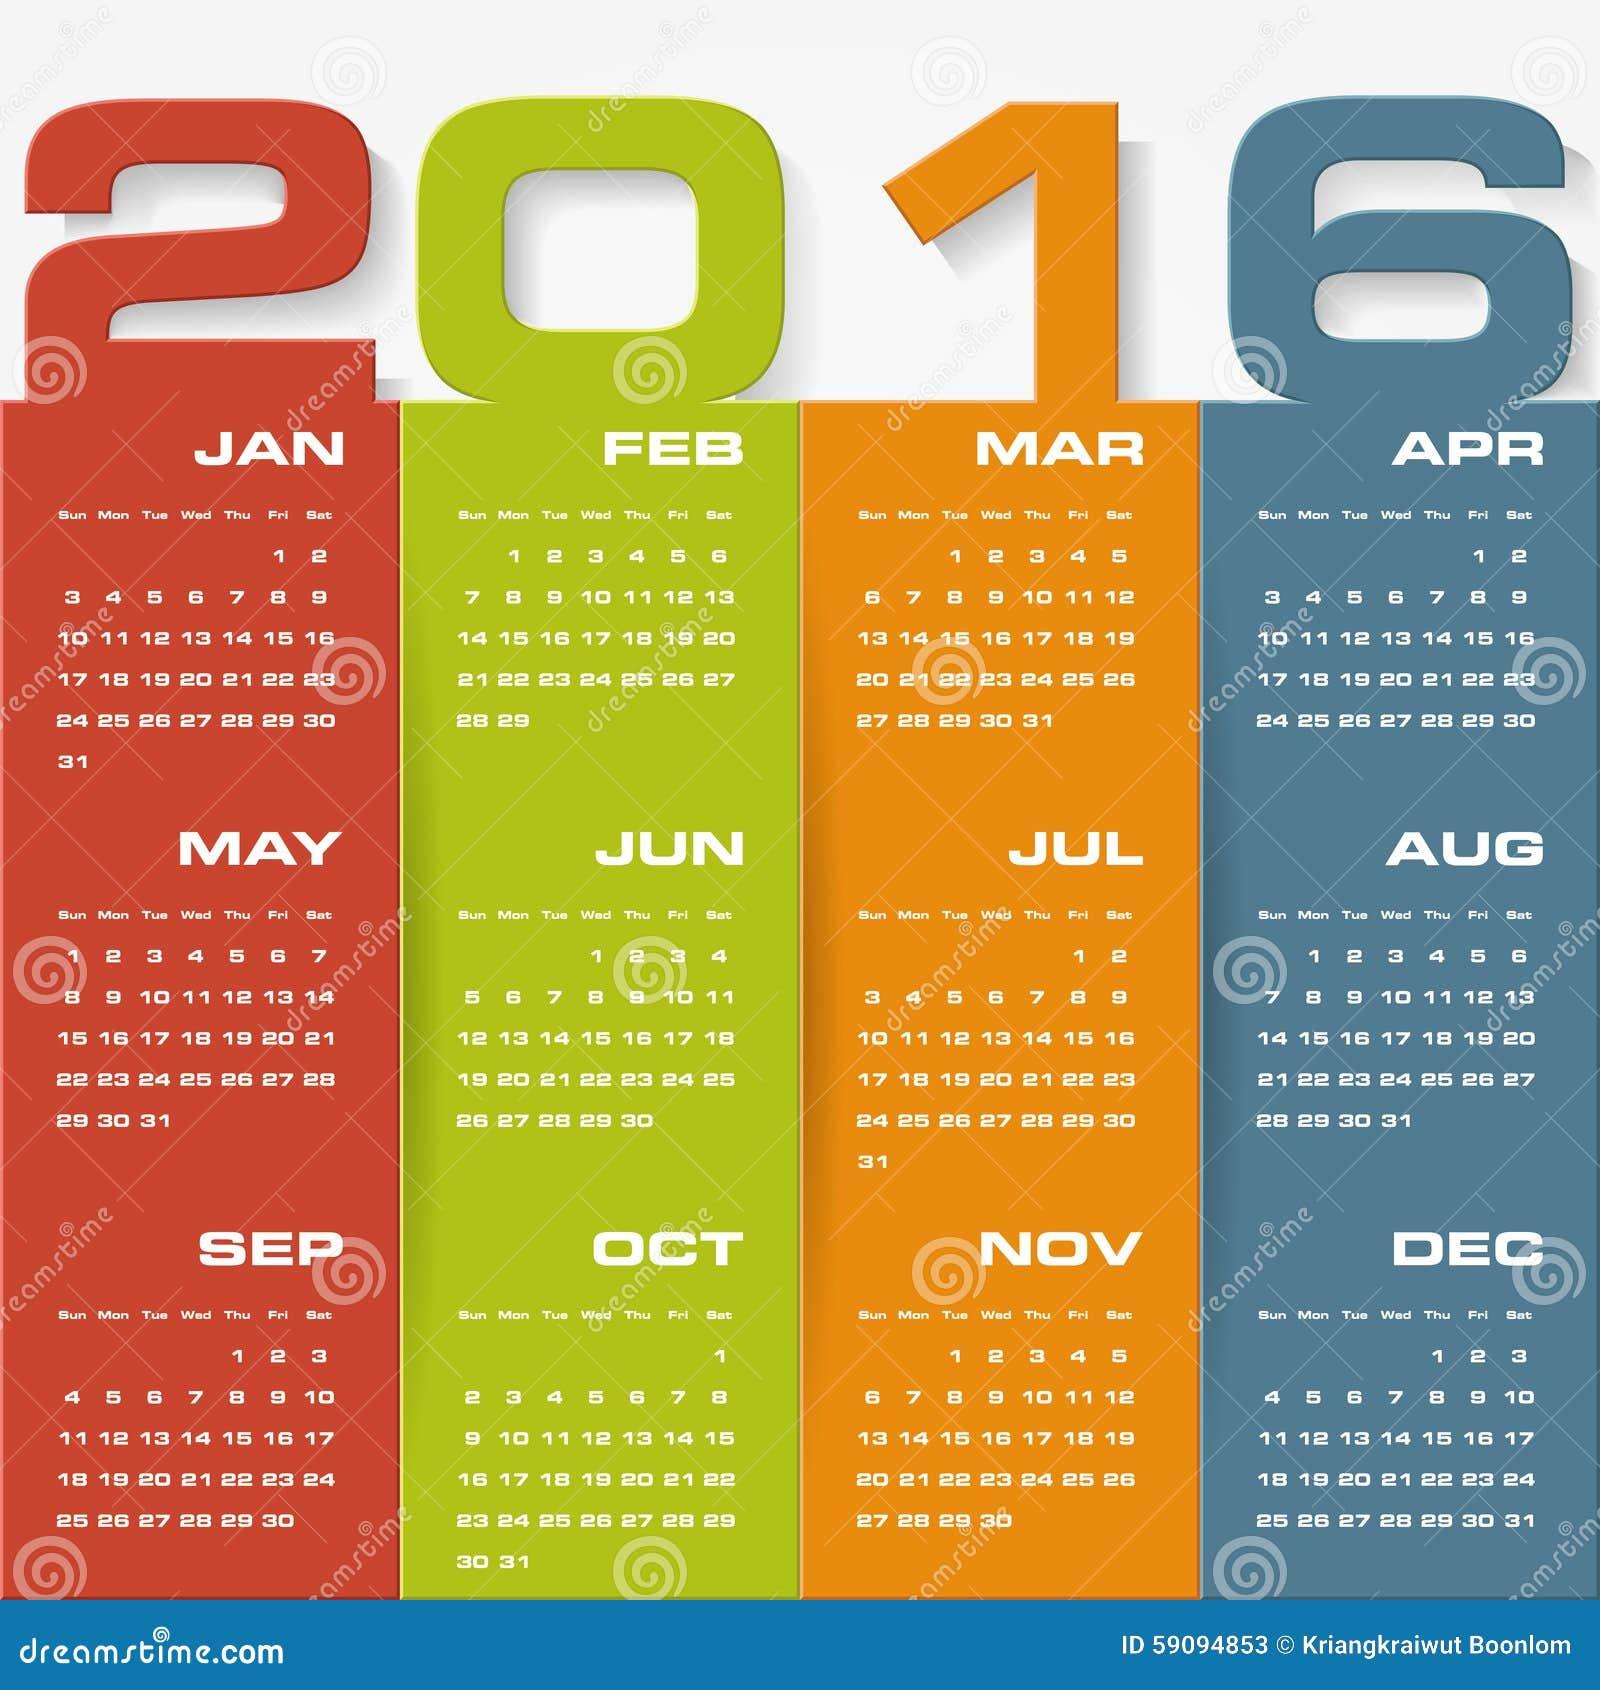 January Calendar Design : Simple design calendar year vector template